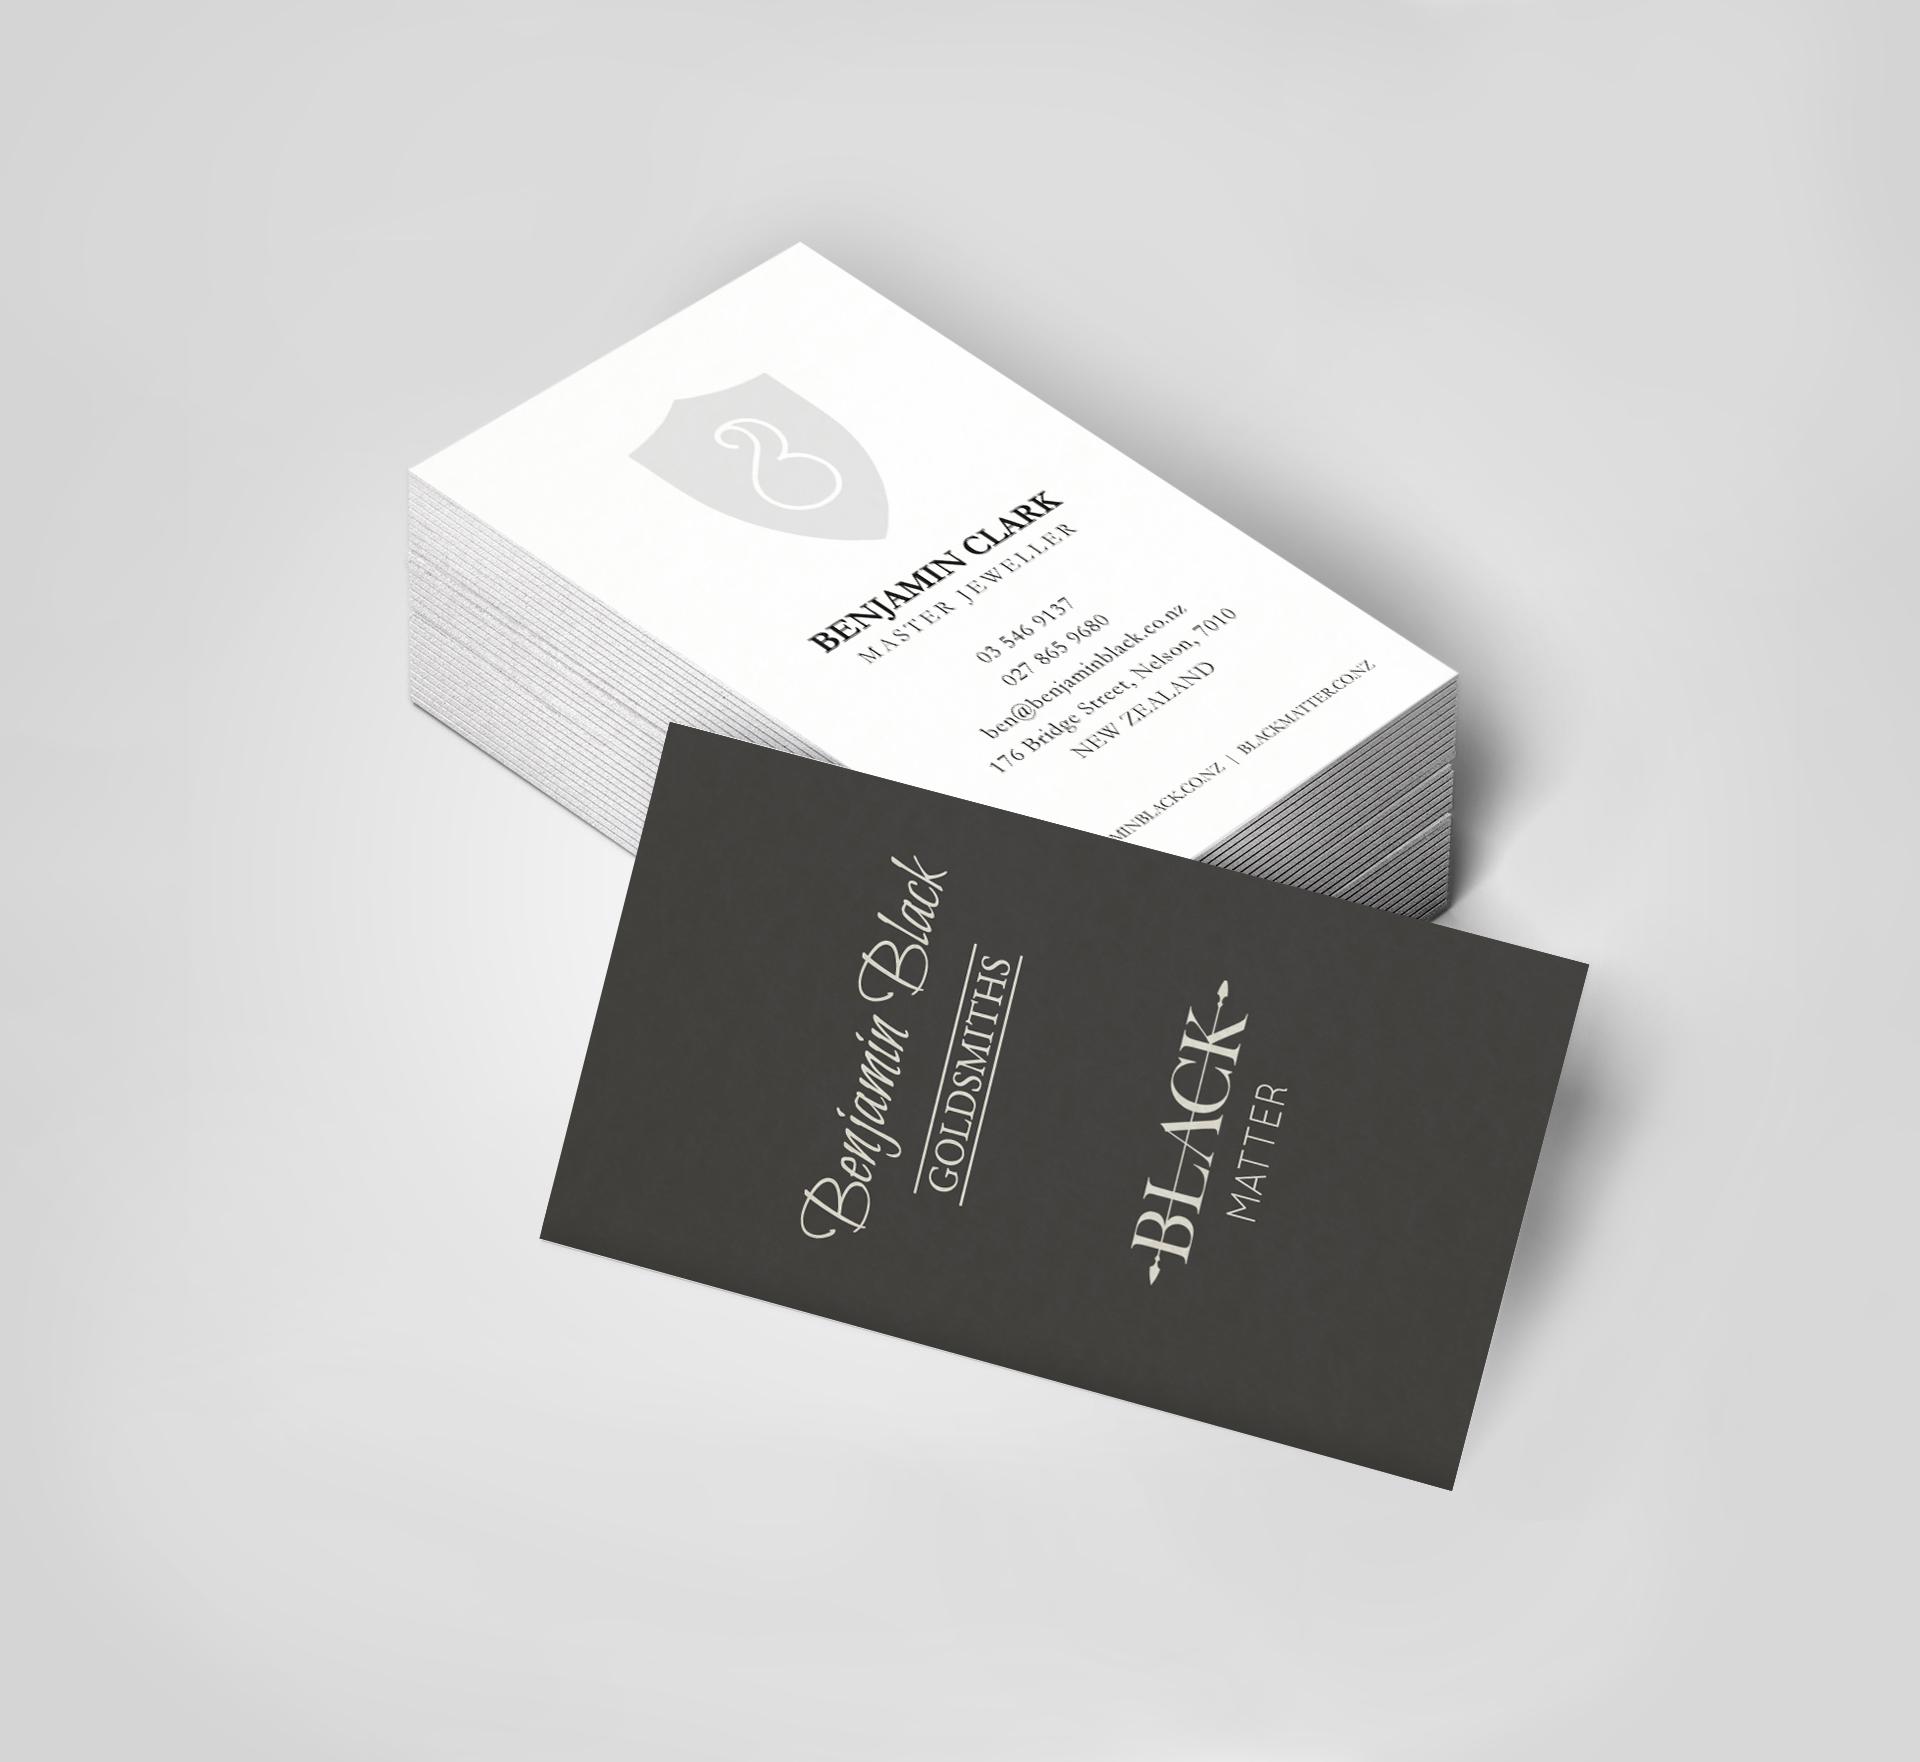 benjamin black goldsmiths  business card design and print